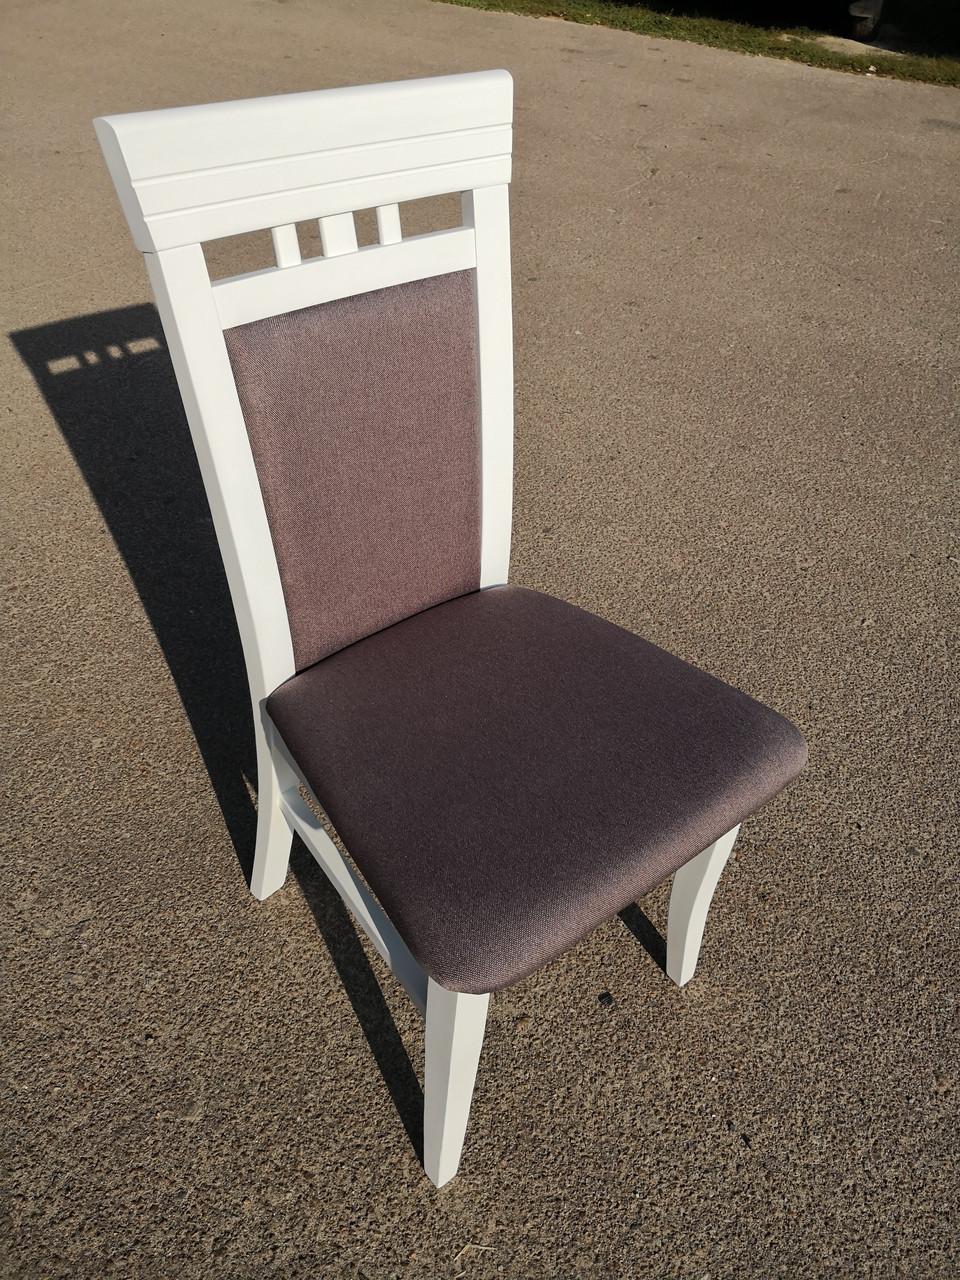 Стул кухонный деревянный  Эссен  Fusion Furniture, цвет белый